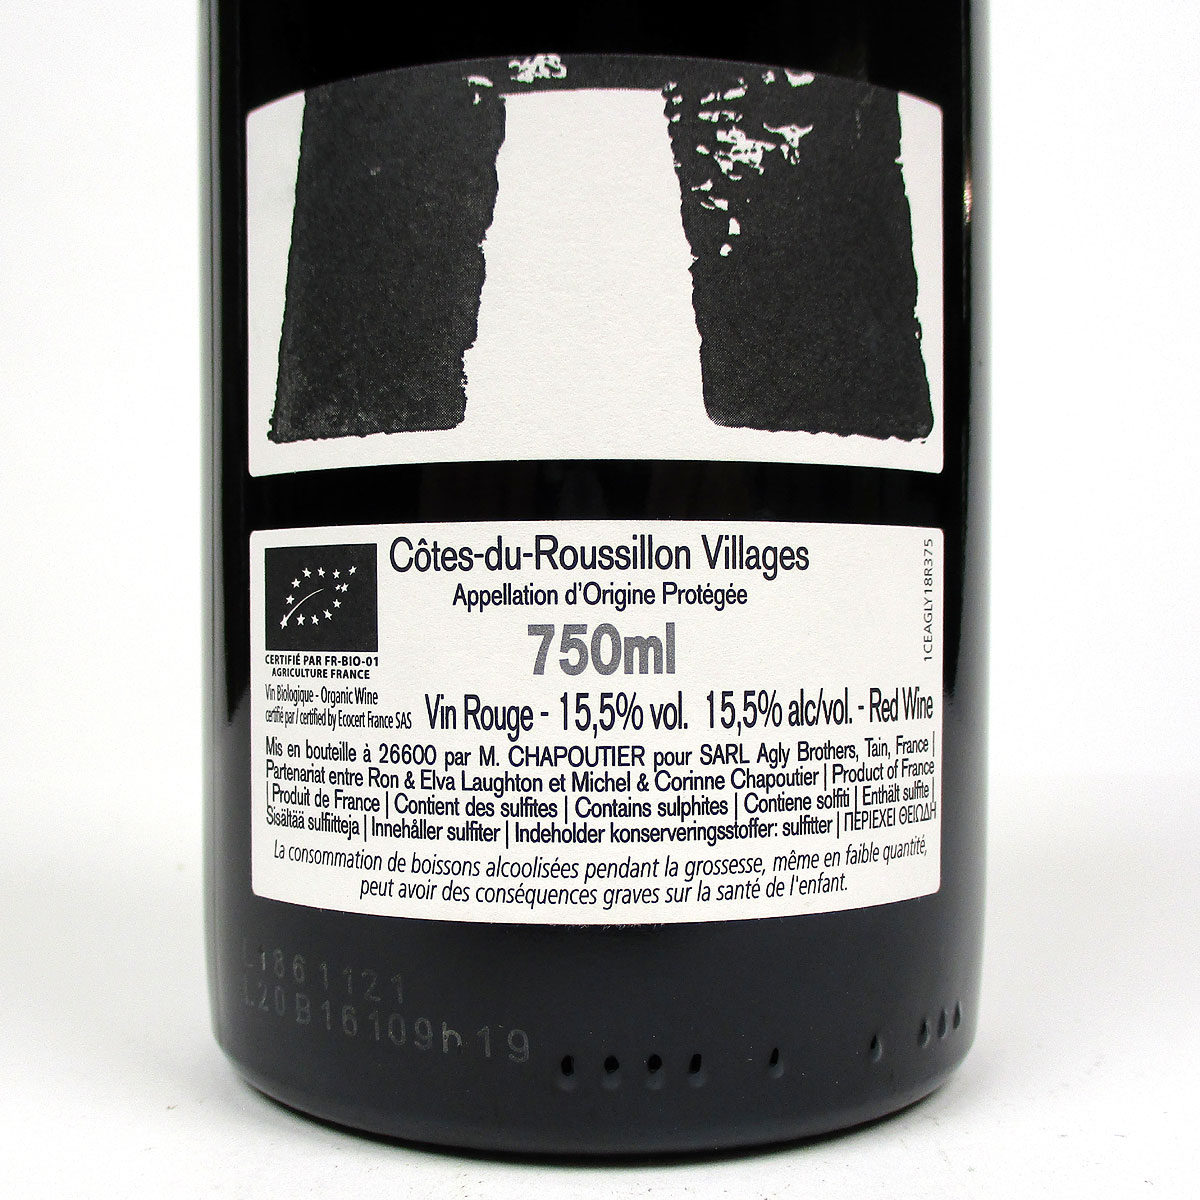 Côtes du Roussillon: Agly Brothers 2018 - Bottle Rear Label